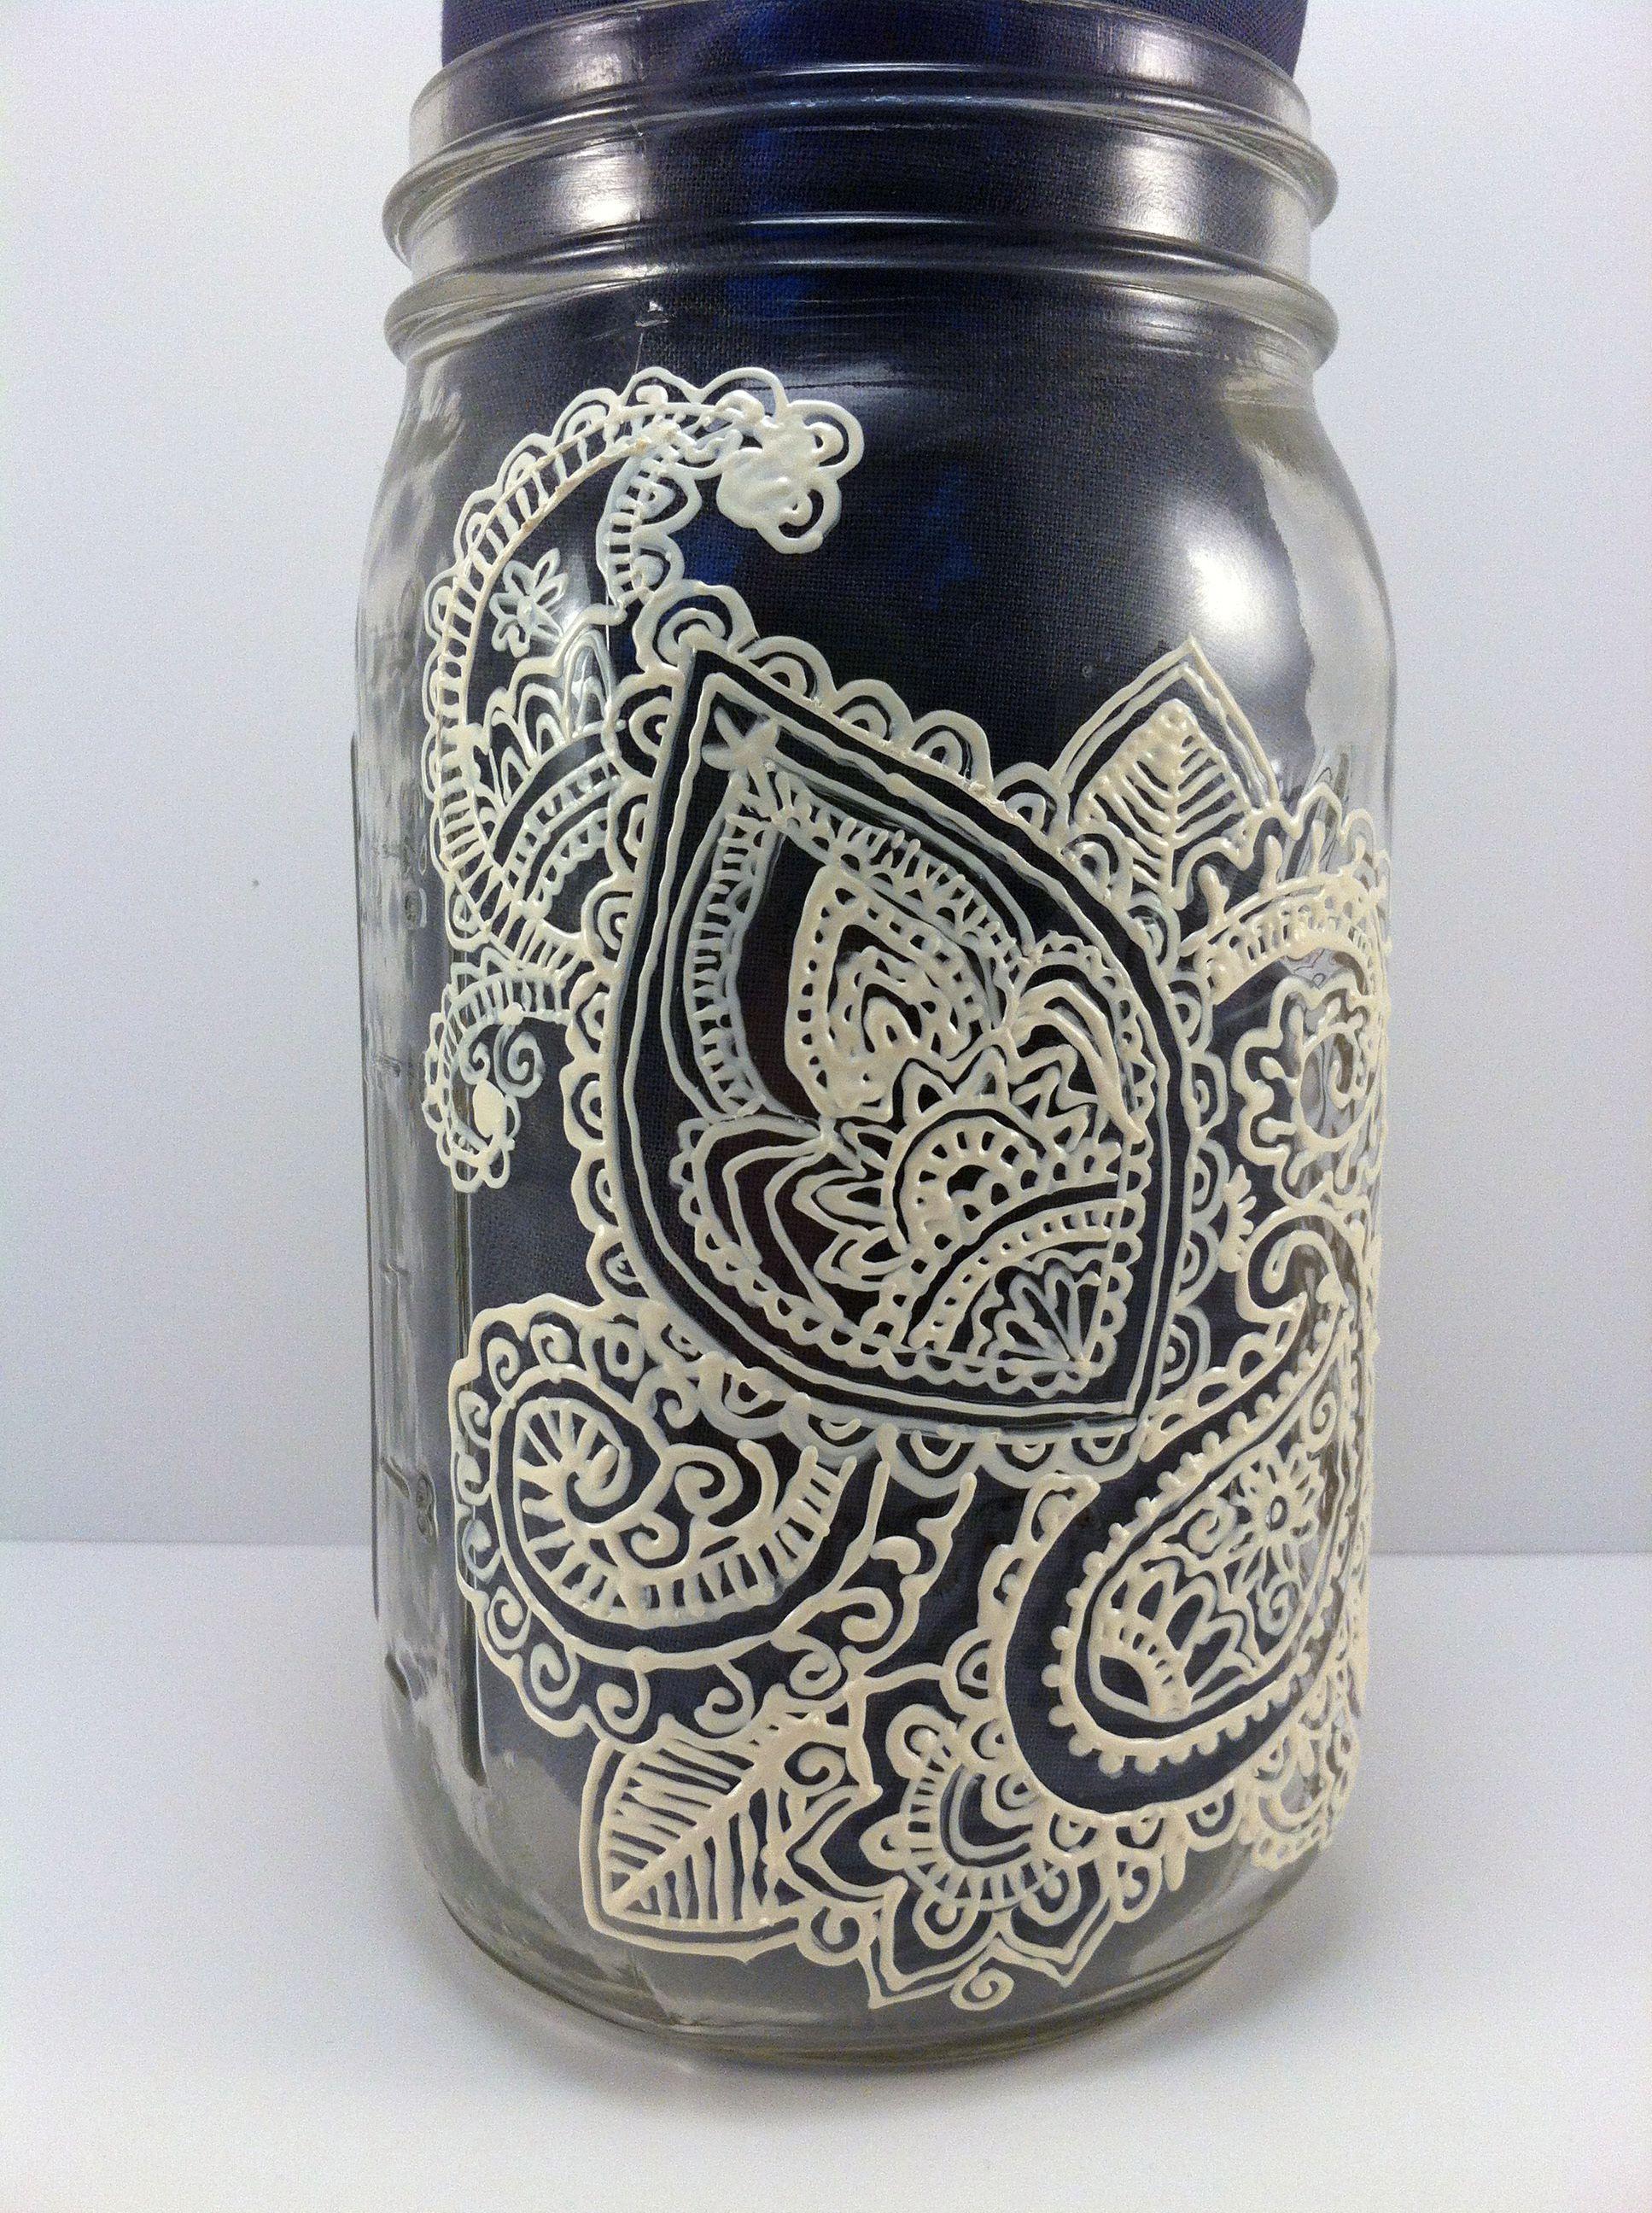 Beautifully Hand Painted Henna Designs On Mason Jars Awesome Etsy